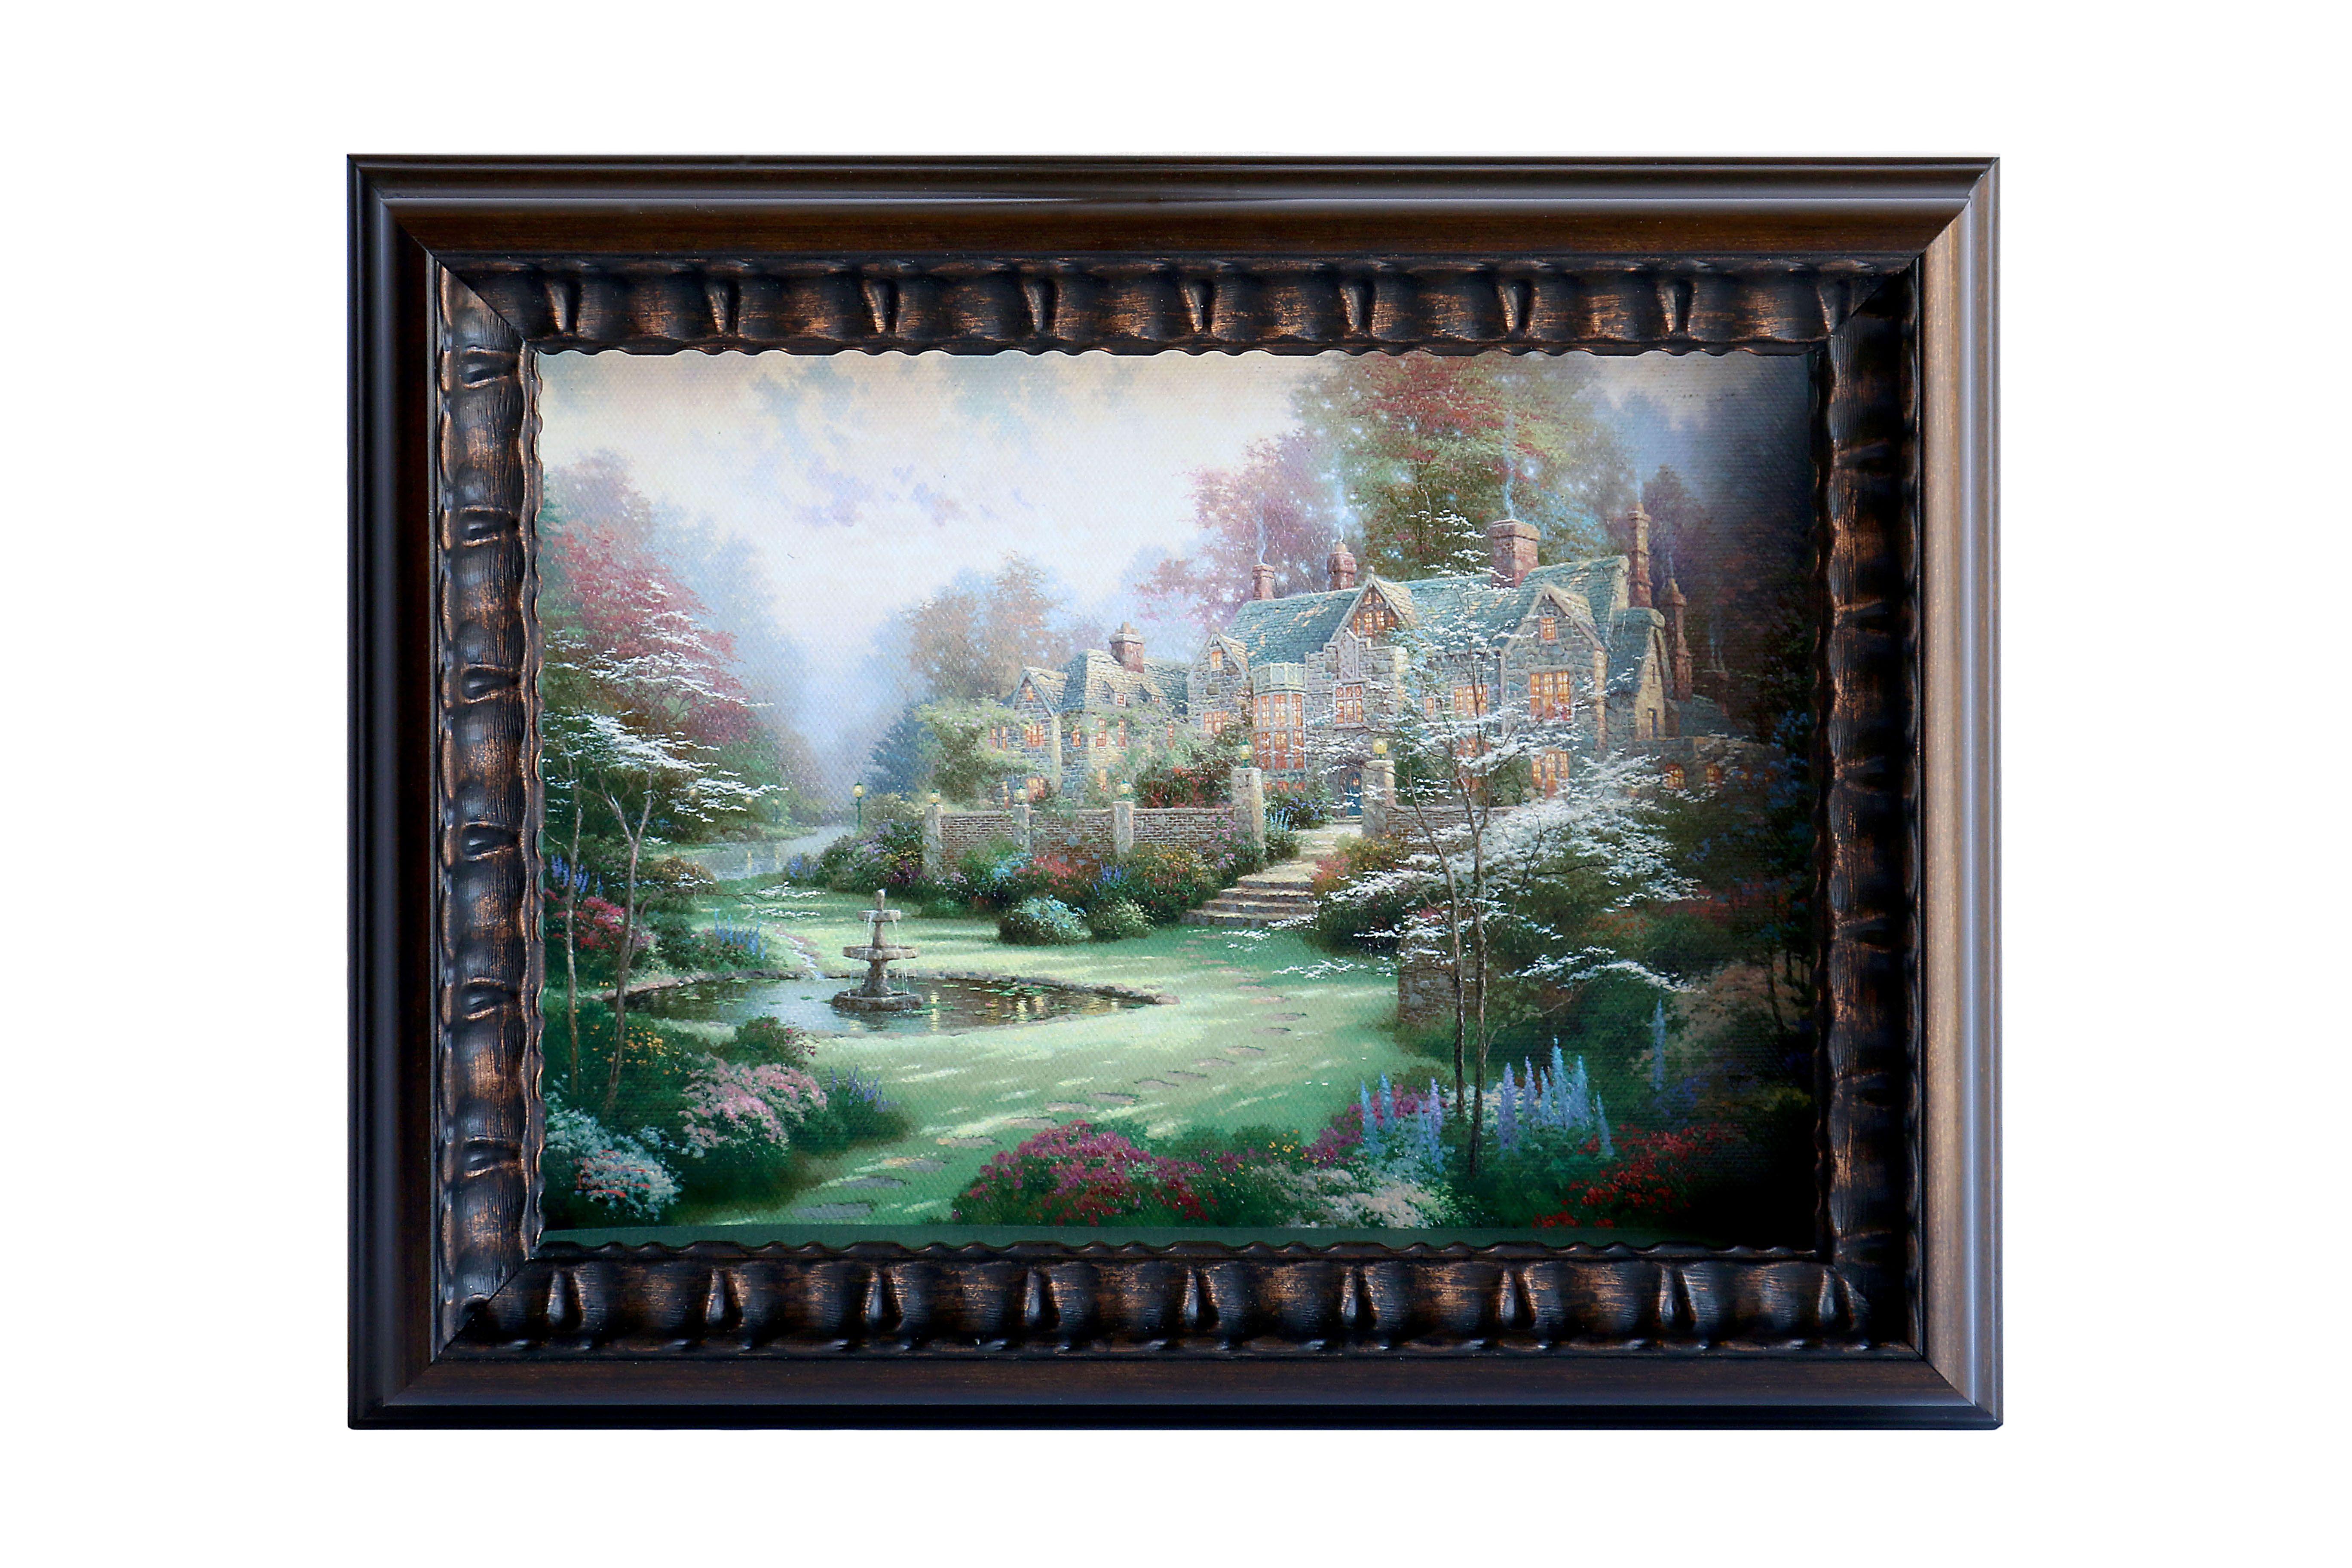 Thomas Kinkade Shadow Box Canvas Prints | Thomas Kinkade on EVINE ...